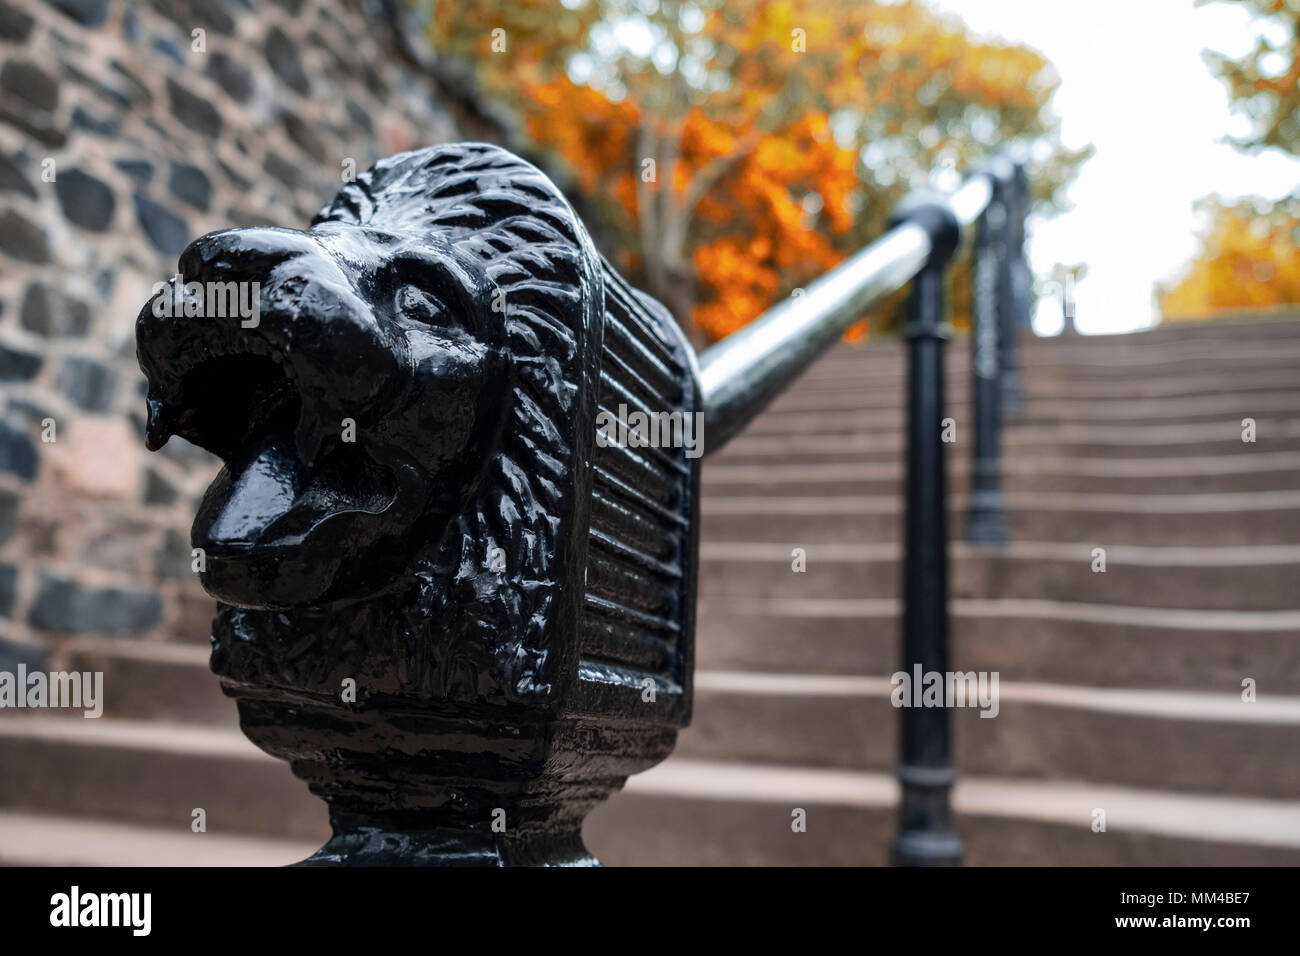 Detail ornate handrail of steps leading to Calton Hill in Edinburgh, Scotland, UK - Stock Image